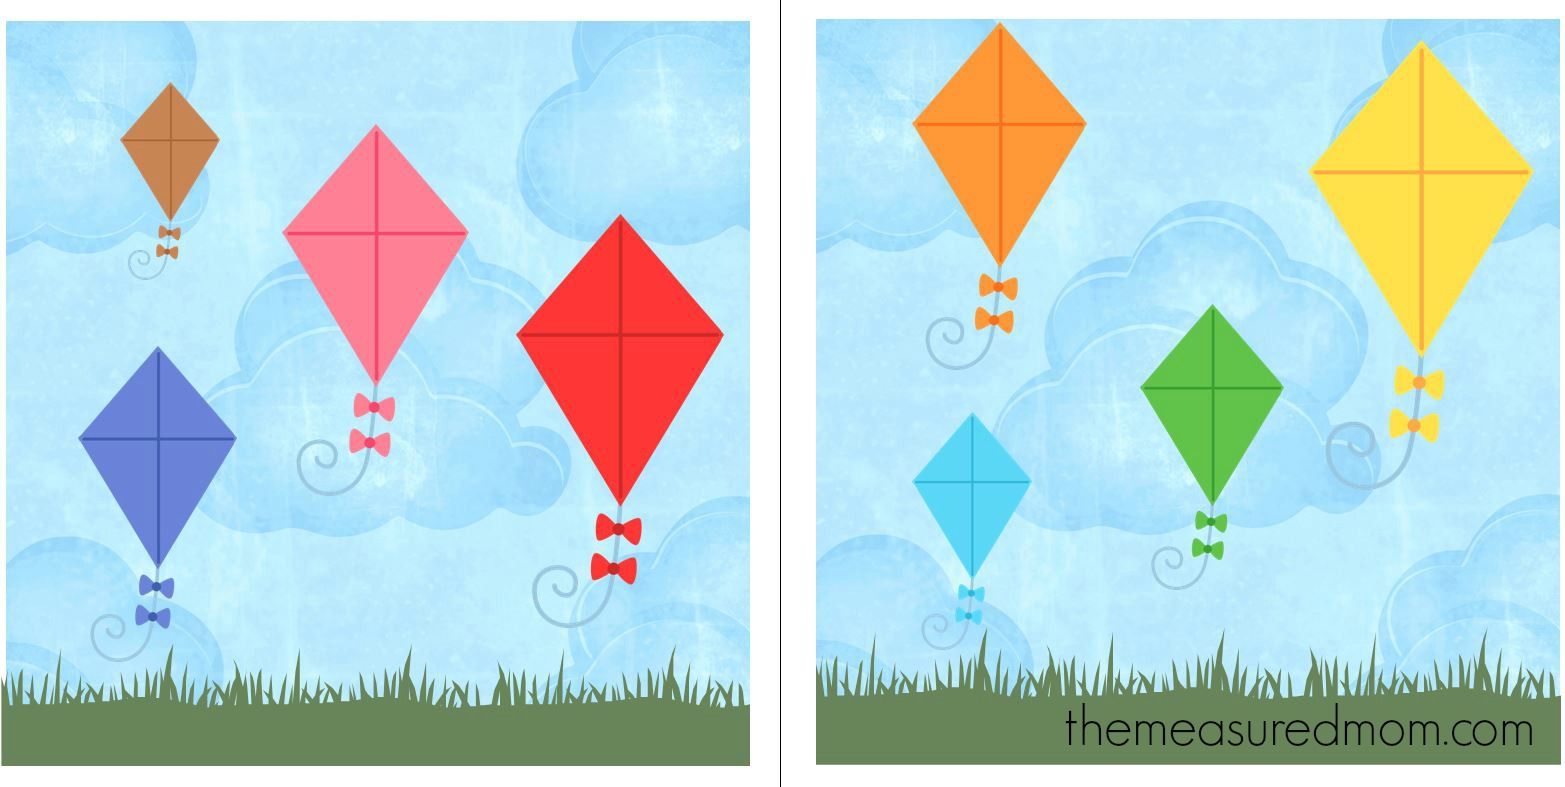 Free File Folder Game For Preschoolers: Kites! - The Measured Mom - File Folder Games For Toddlers Free Printable